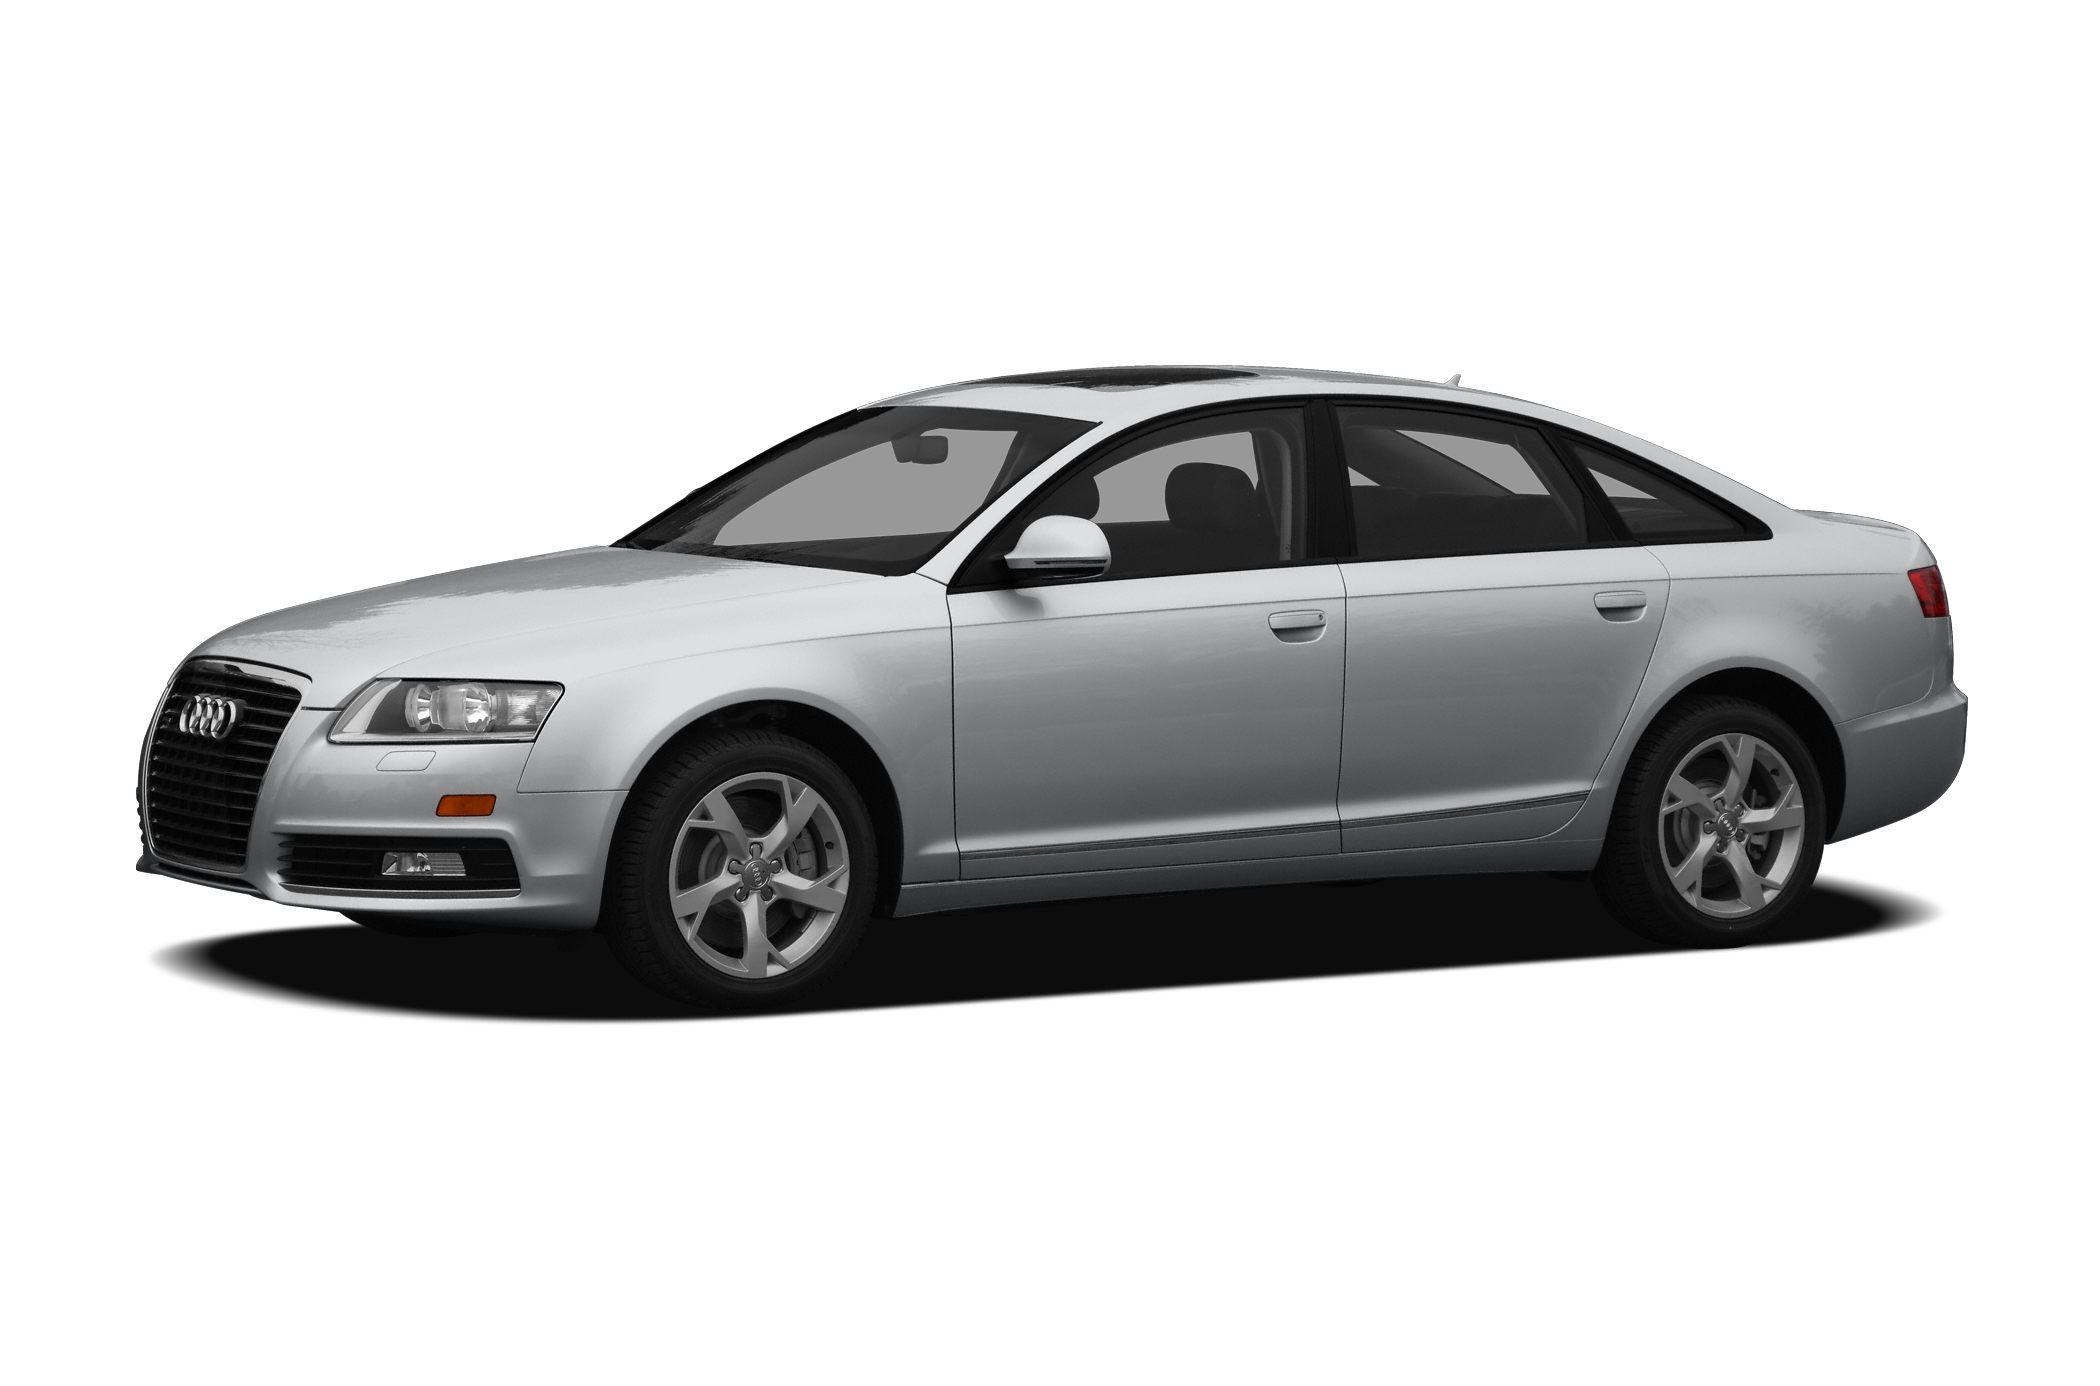 2009 Audi A6 4 2 Prestige 4dr All wheel Drive quattro Sedan Specs